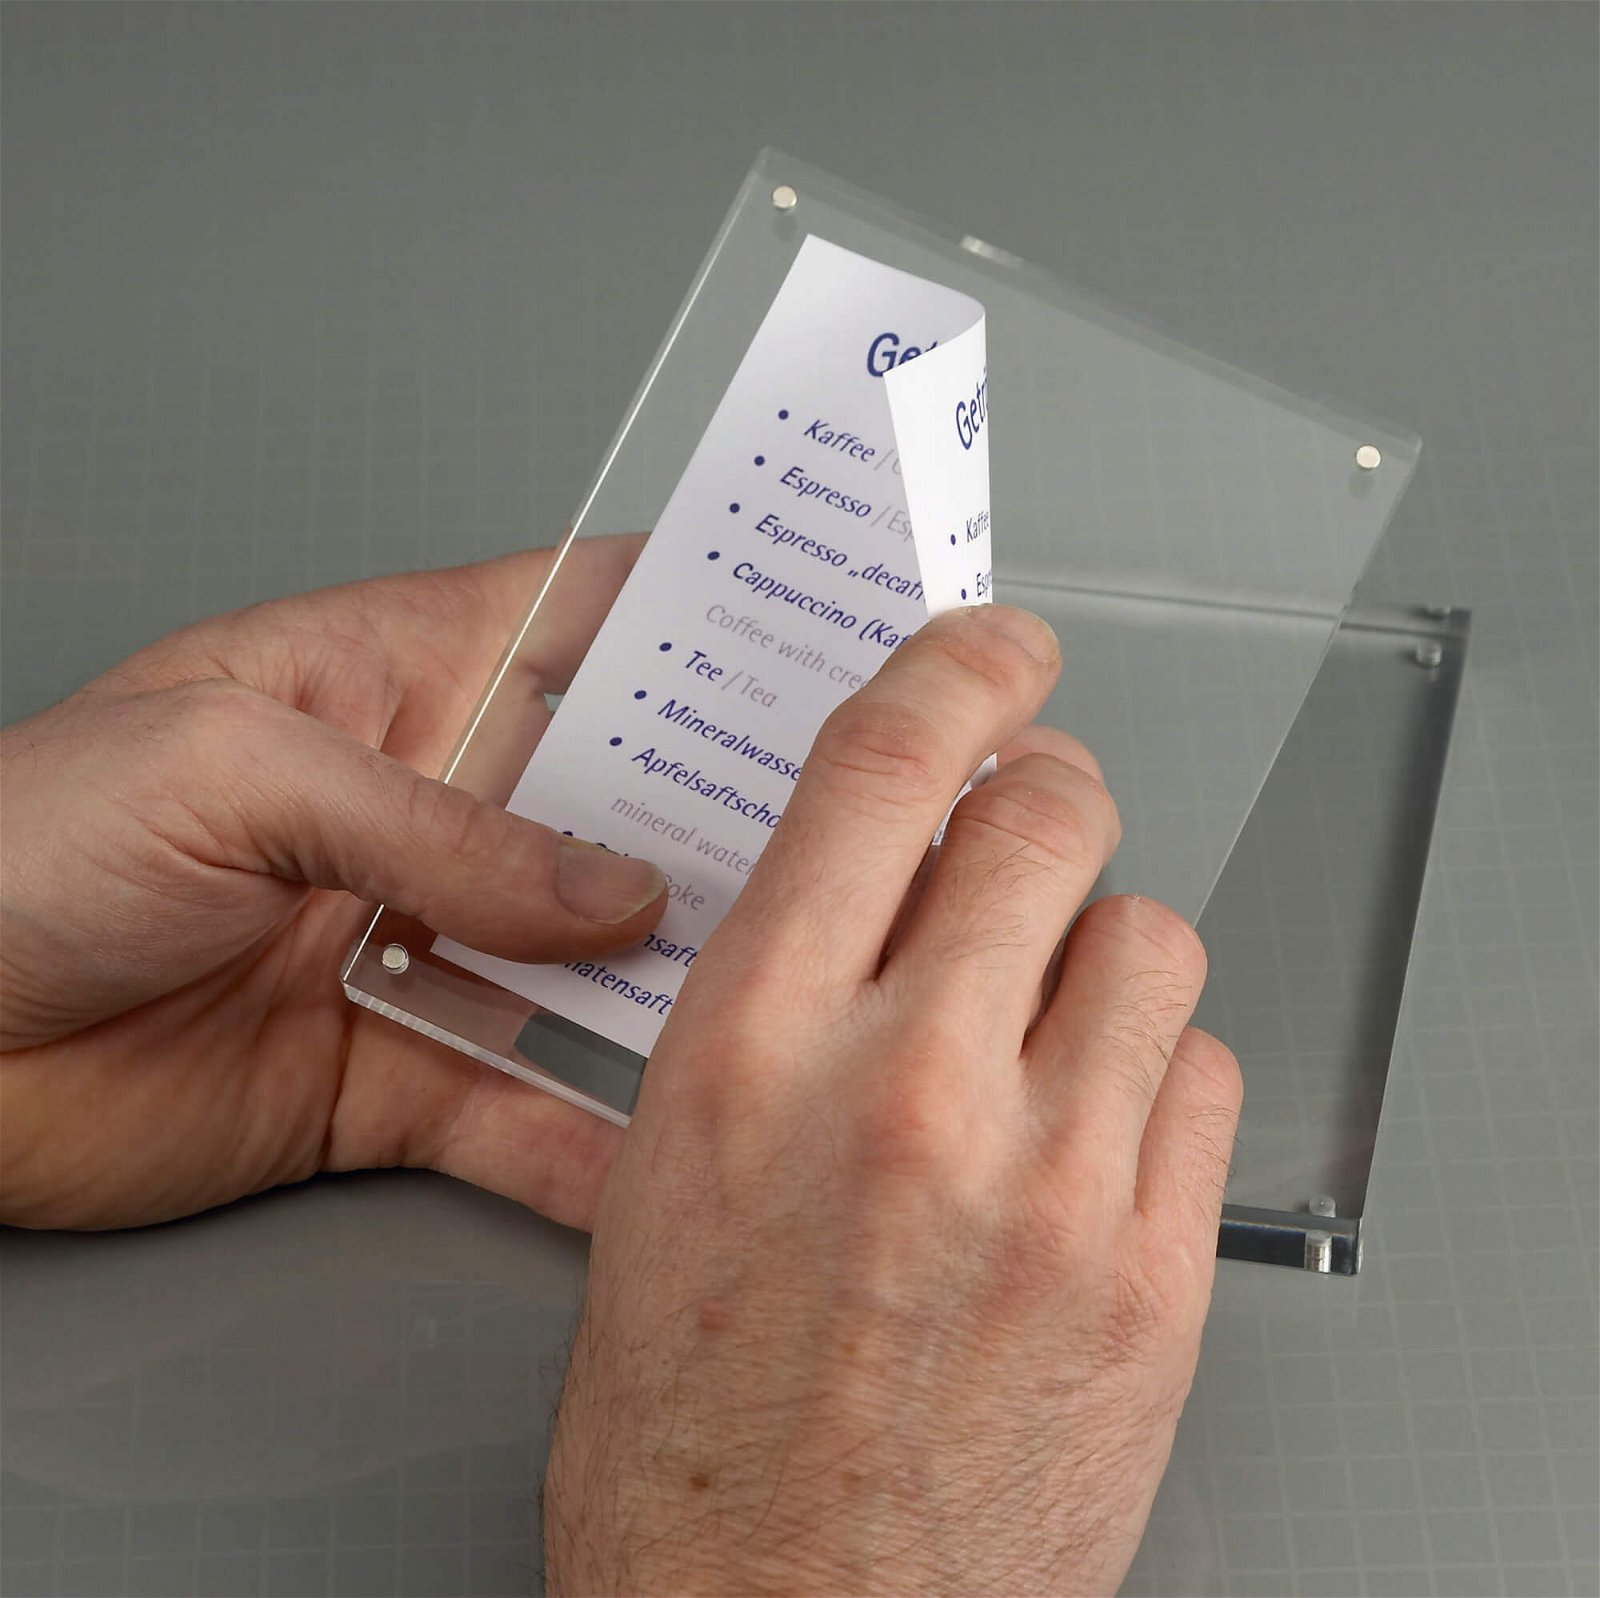 Acryl-Bilderhalter, 11,5 x 9 x 2,4 cm, glasklar